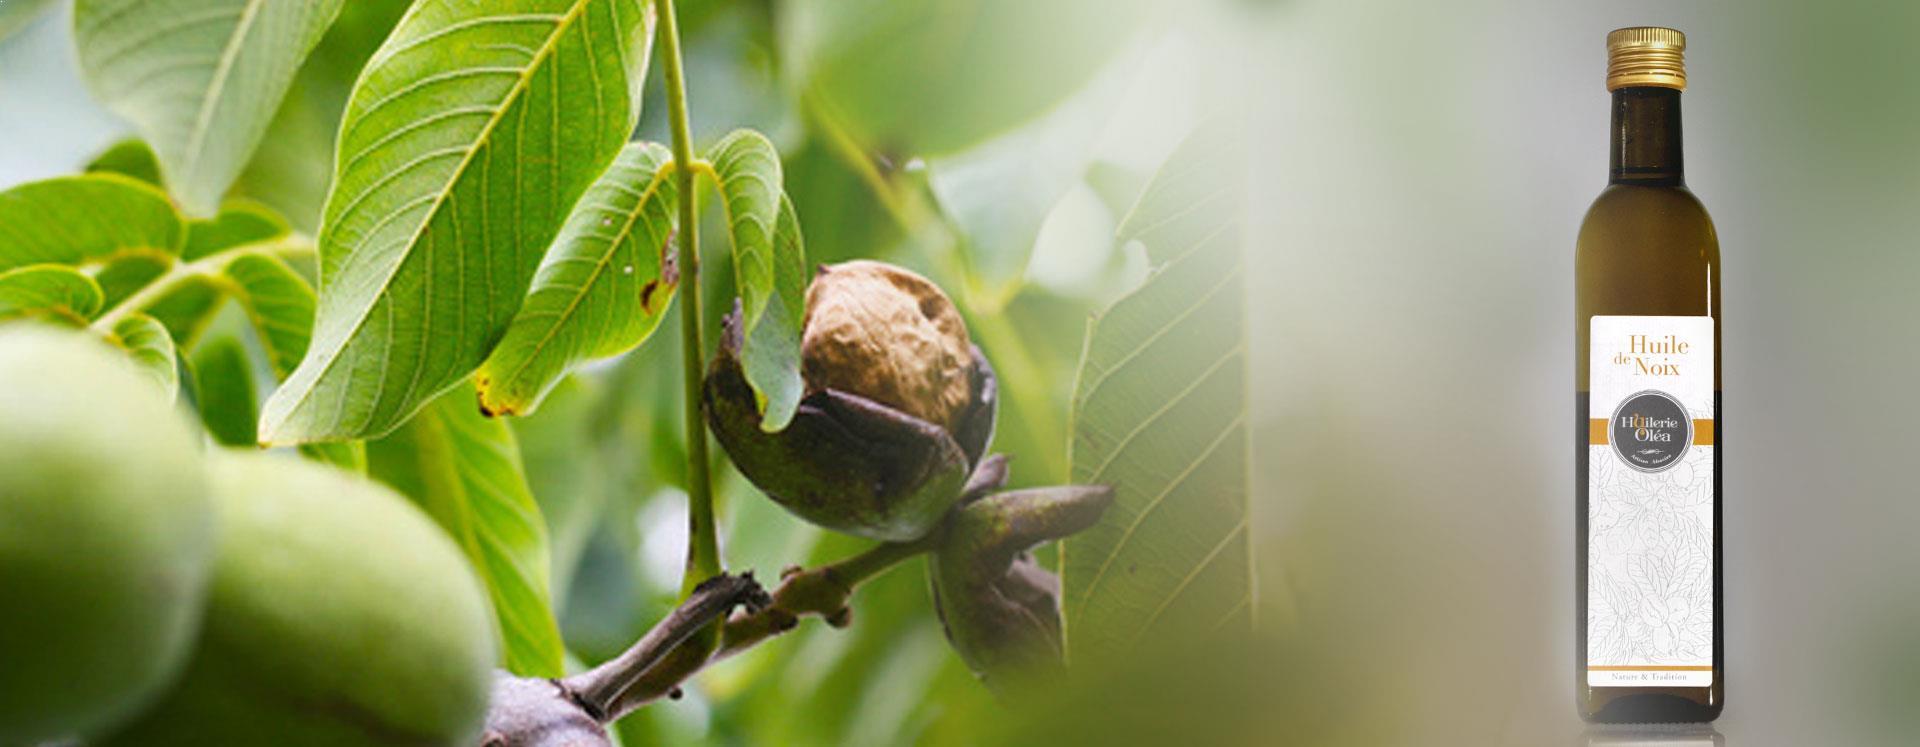 olea-accueil-notre-huilerie-huile-de-noix-2